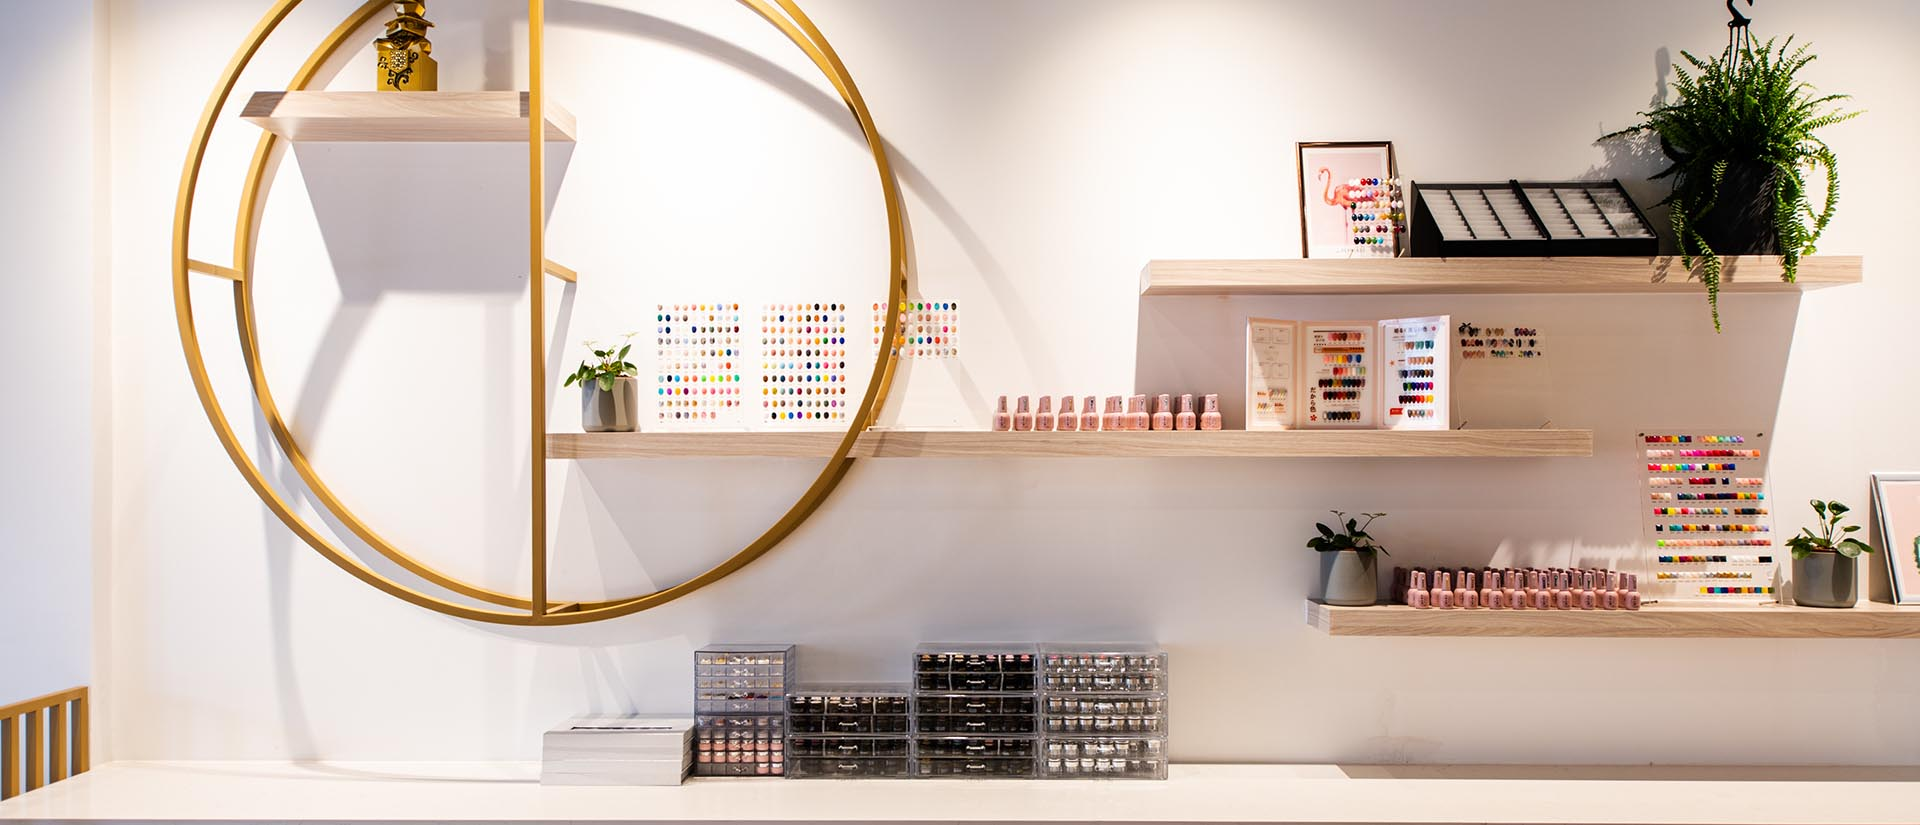 Projects-Retail_Hikari Beauty 4